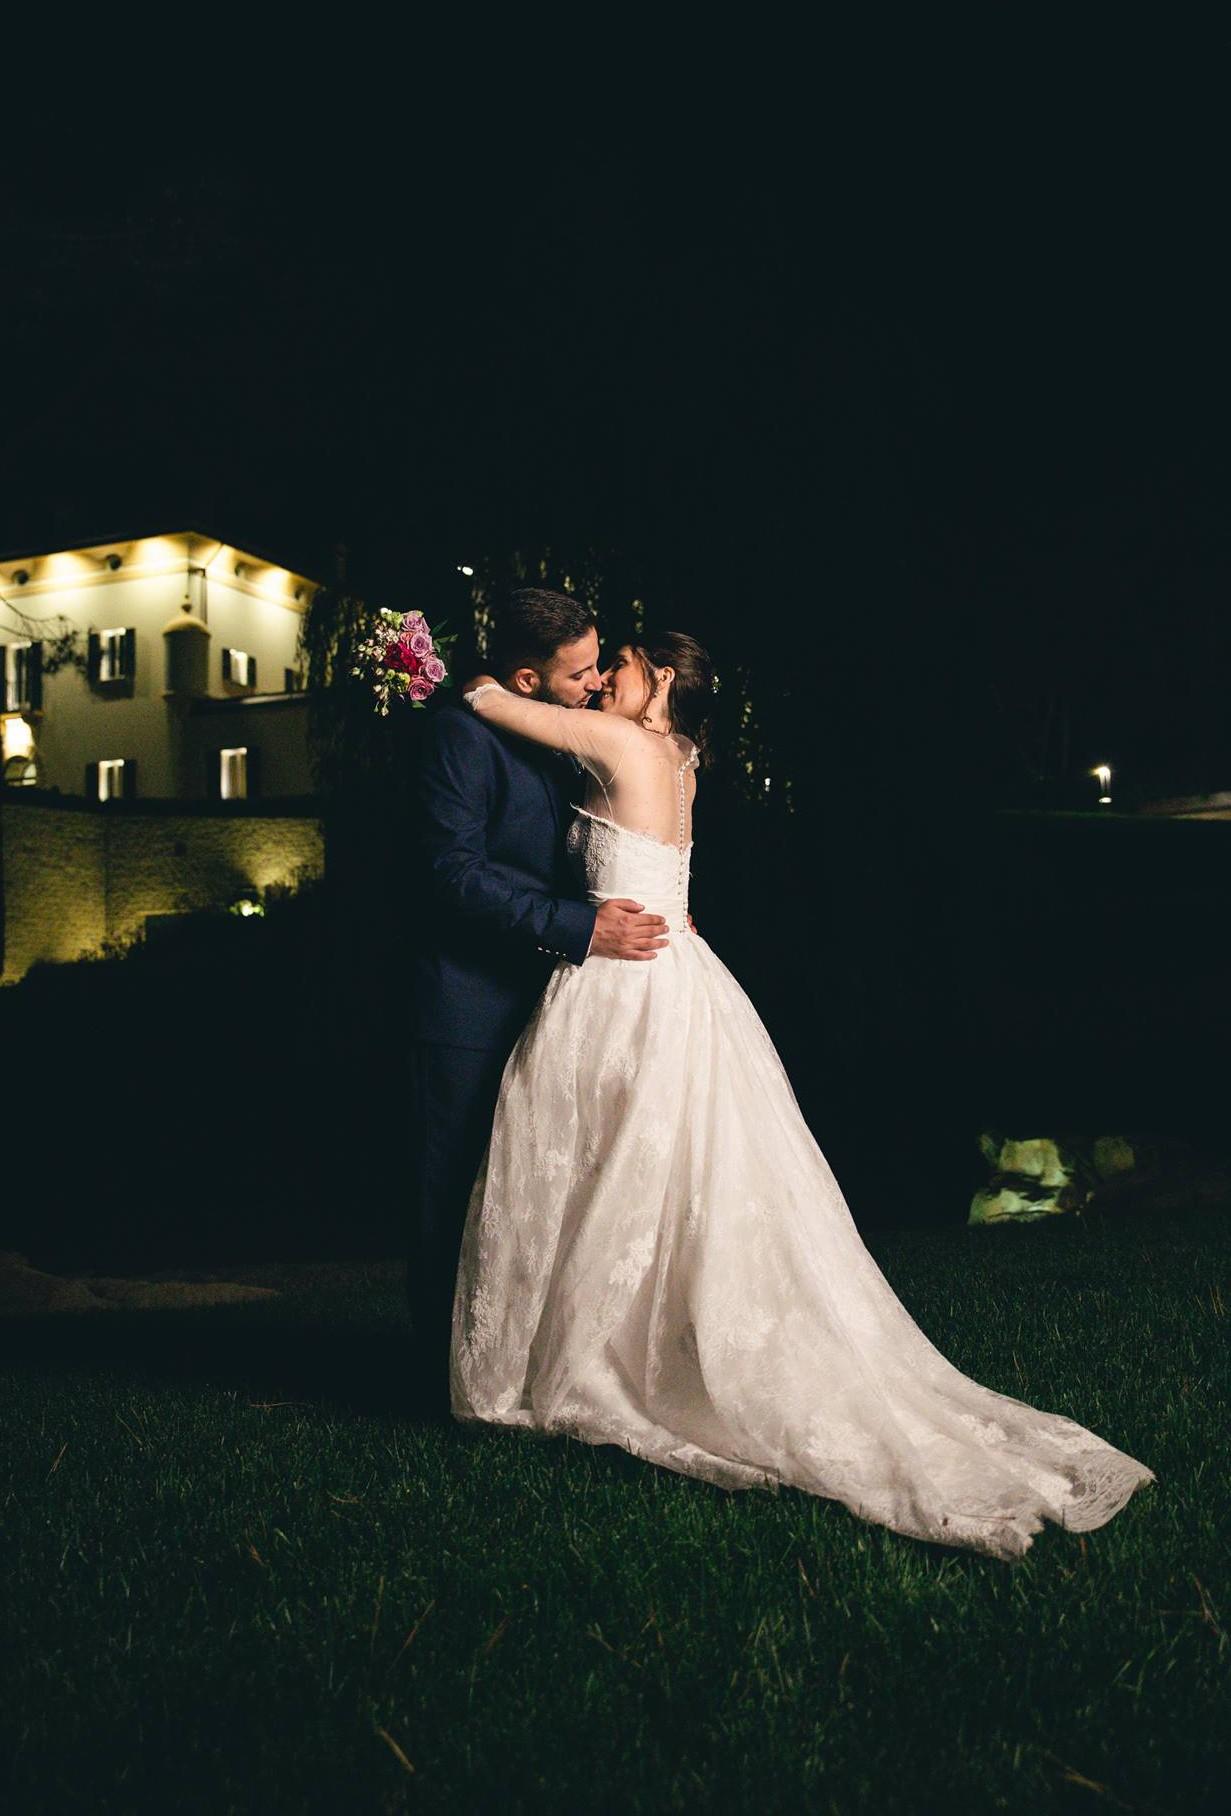 Inspiration mariage nuit - Robe de mariée Cymbeline Wedding inspiration - Ispirazione sposa - Inspiração casamento - Inspiration Brautkleid - Inspiración matrimonio